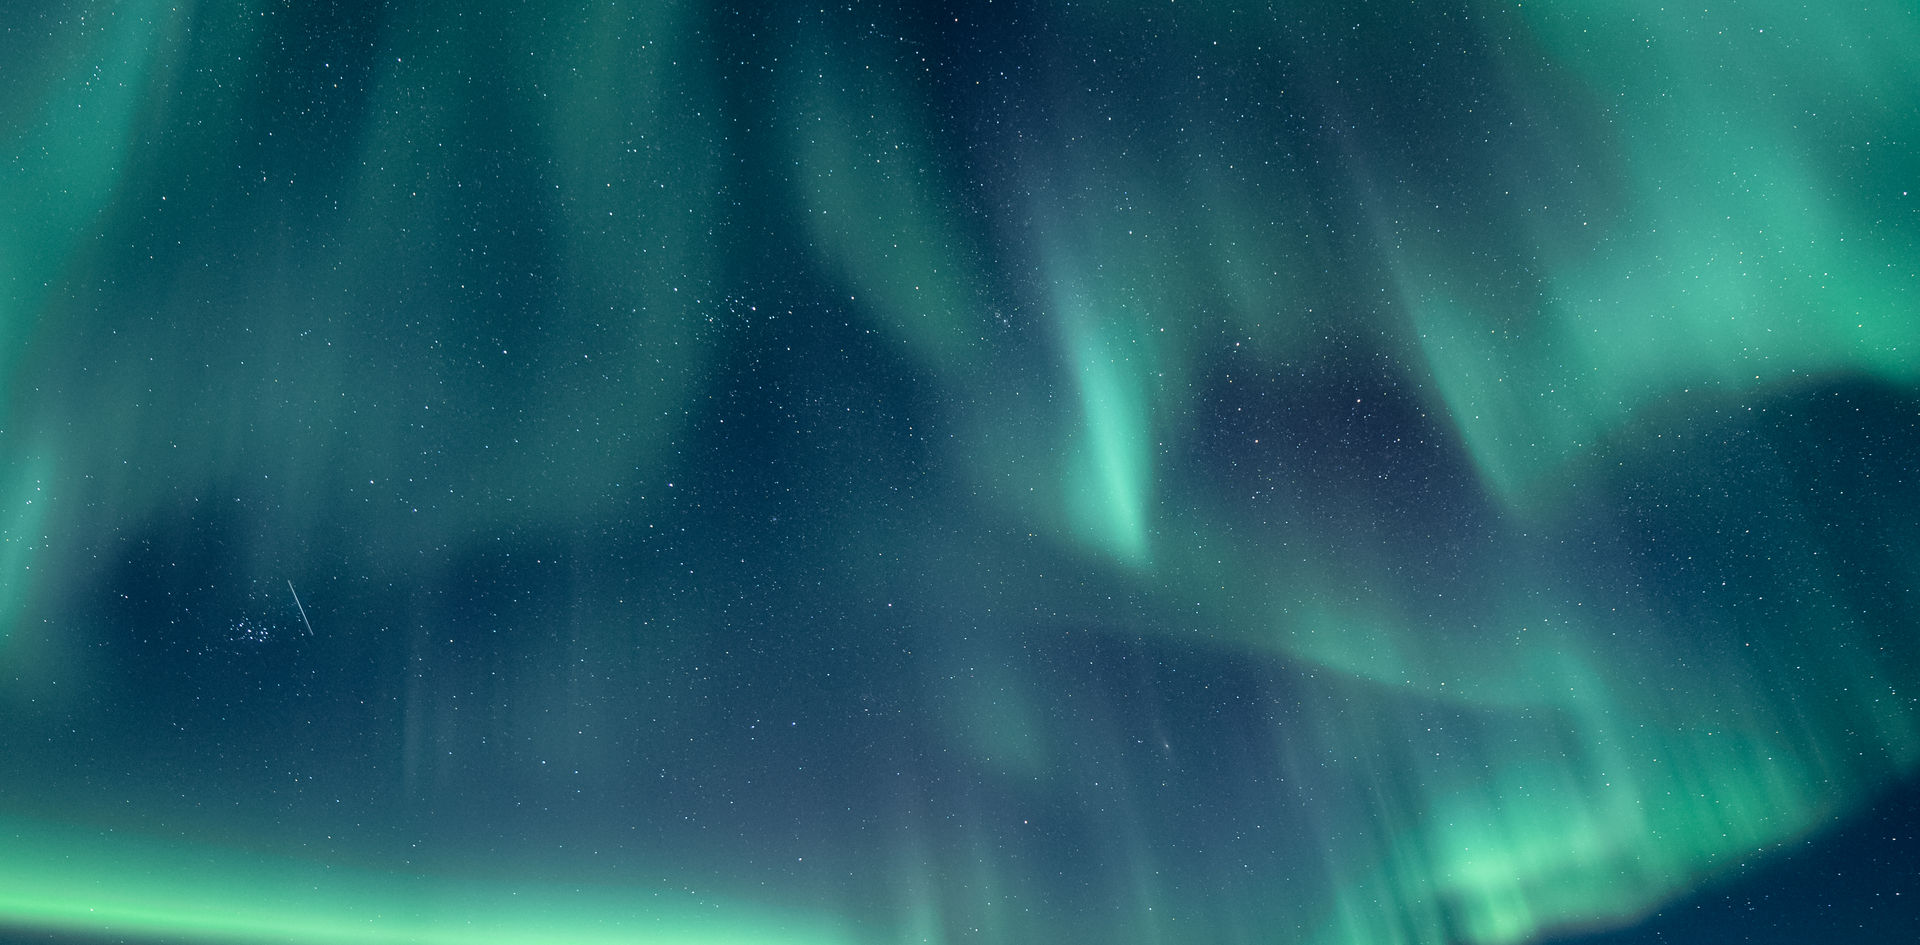 Dance of the Aurora